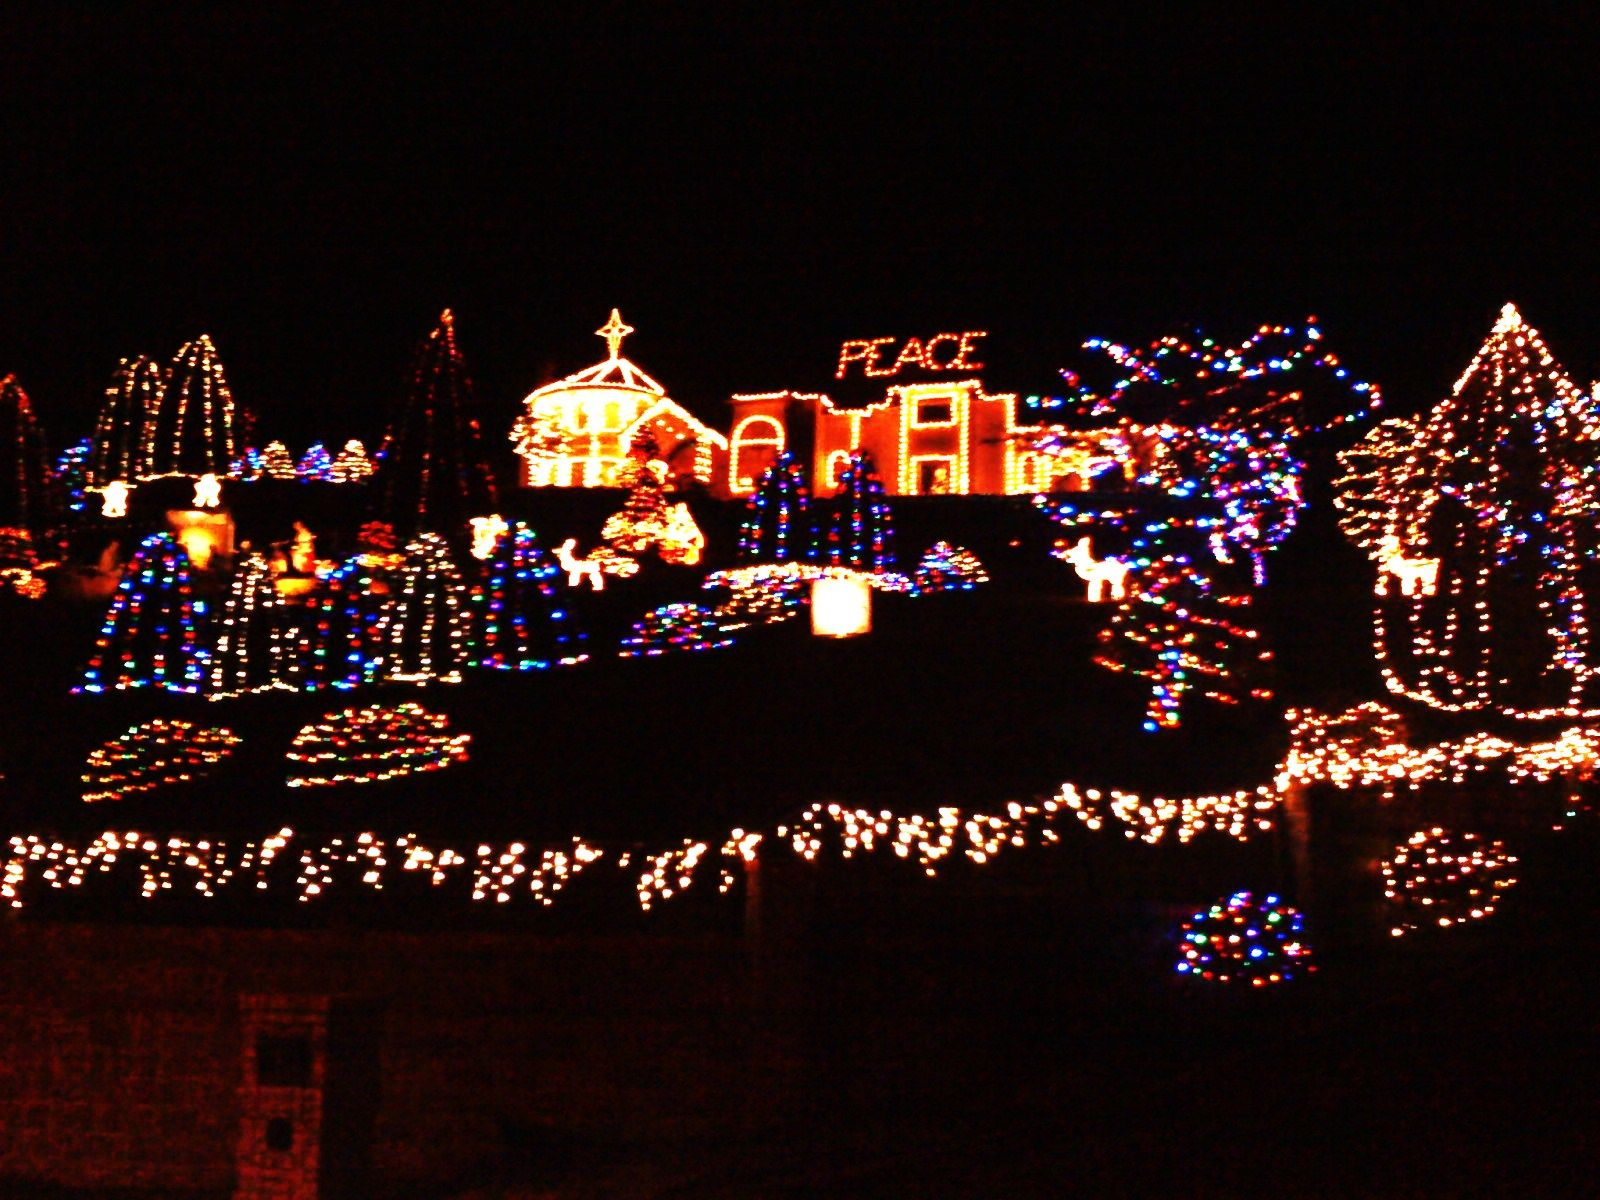 McLean Blvd. mansion at Christmas Eugene, OR | Eugene, my home in ...